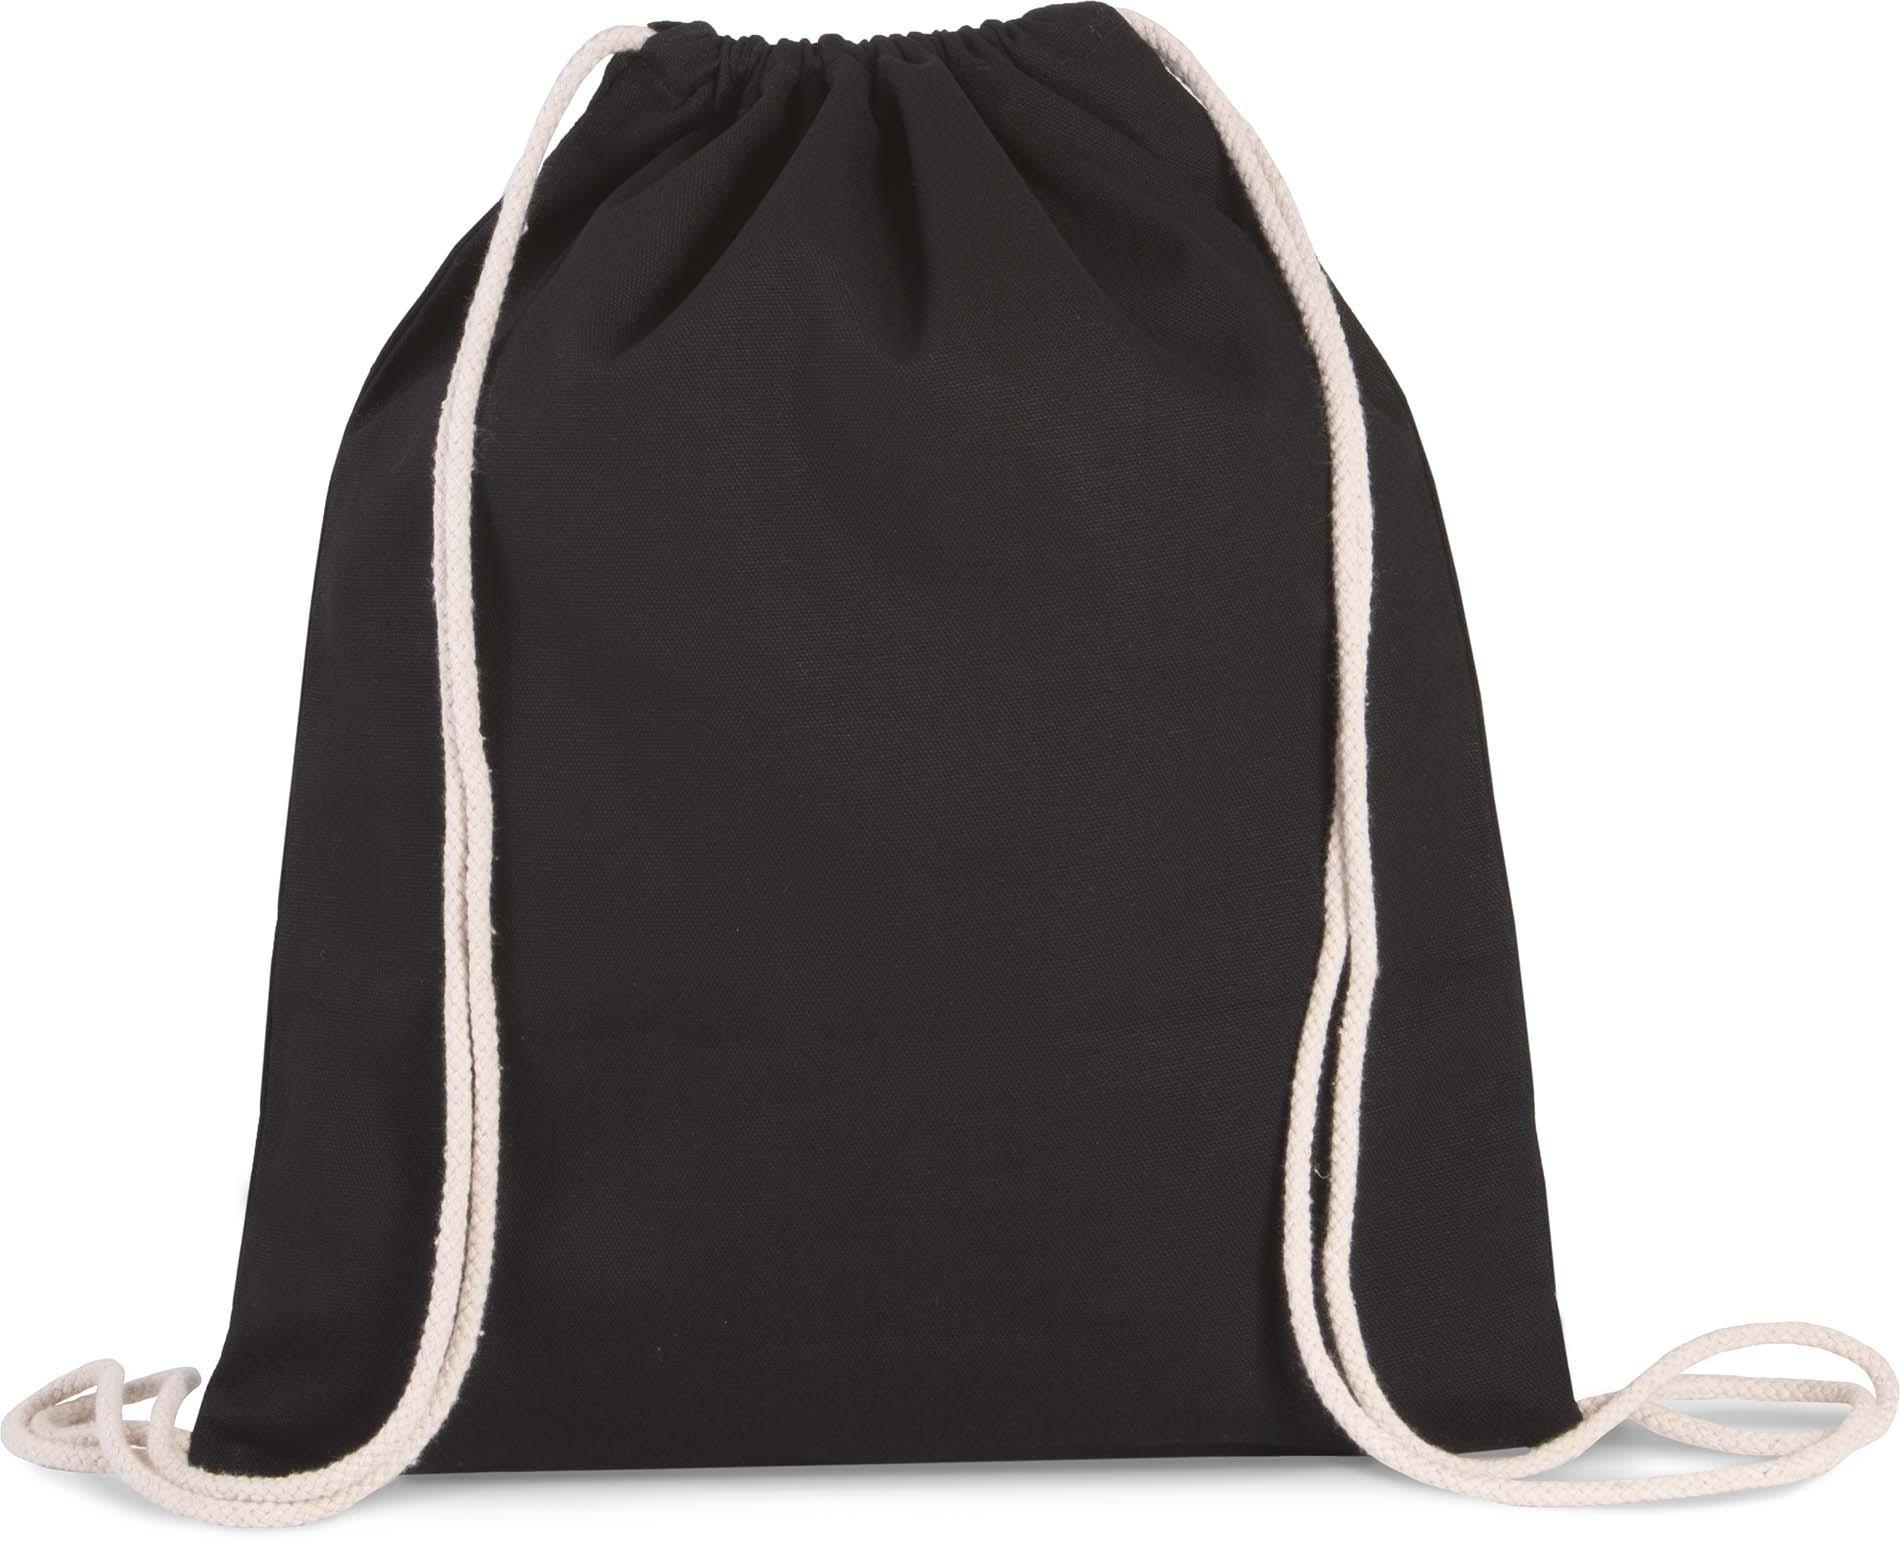 Sac à dos avec cordon épais - 2-1632-6